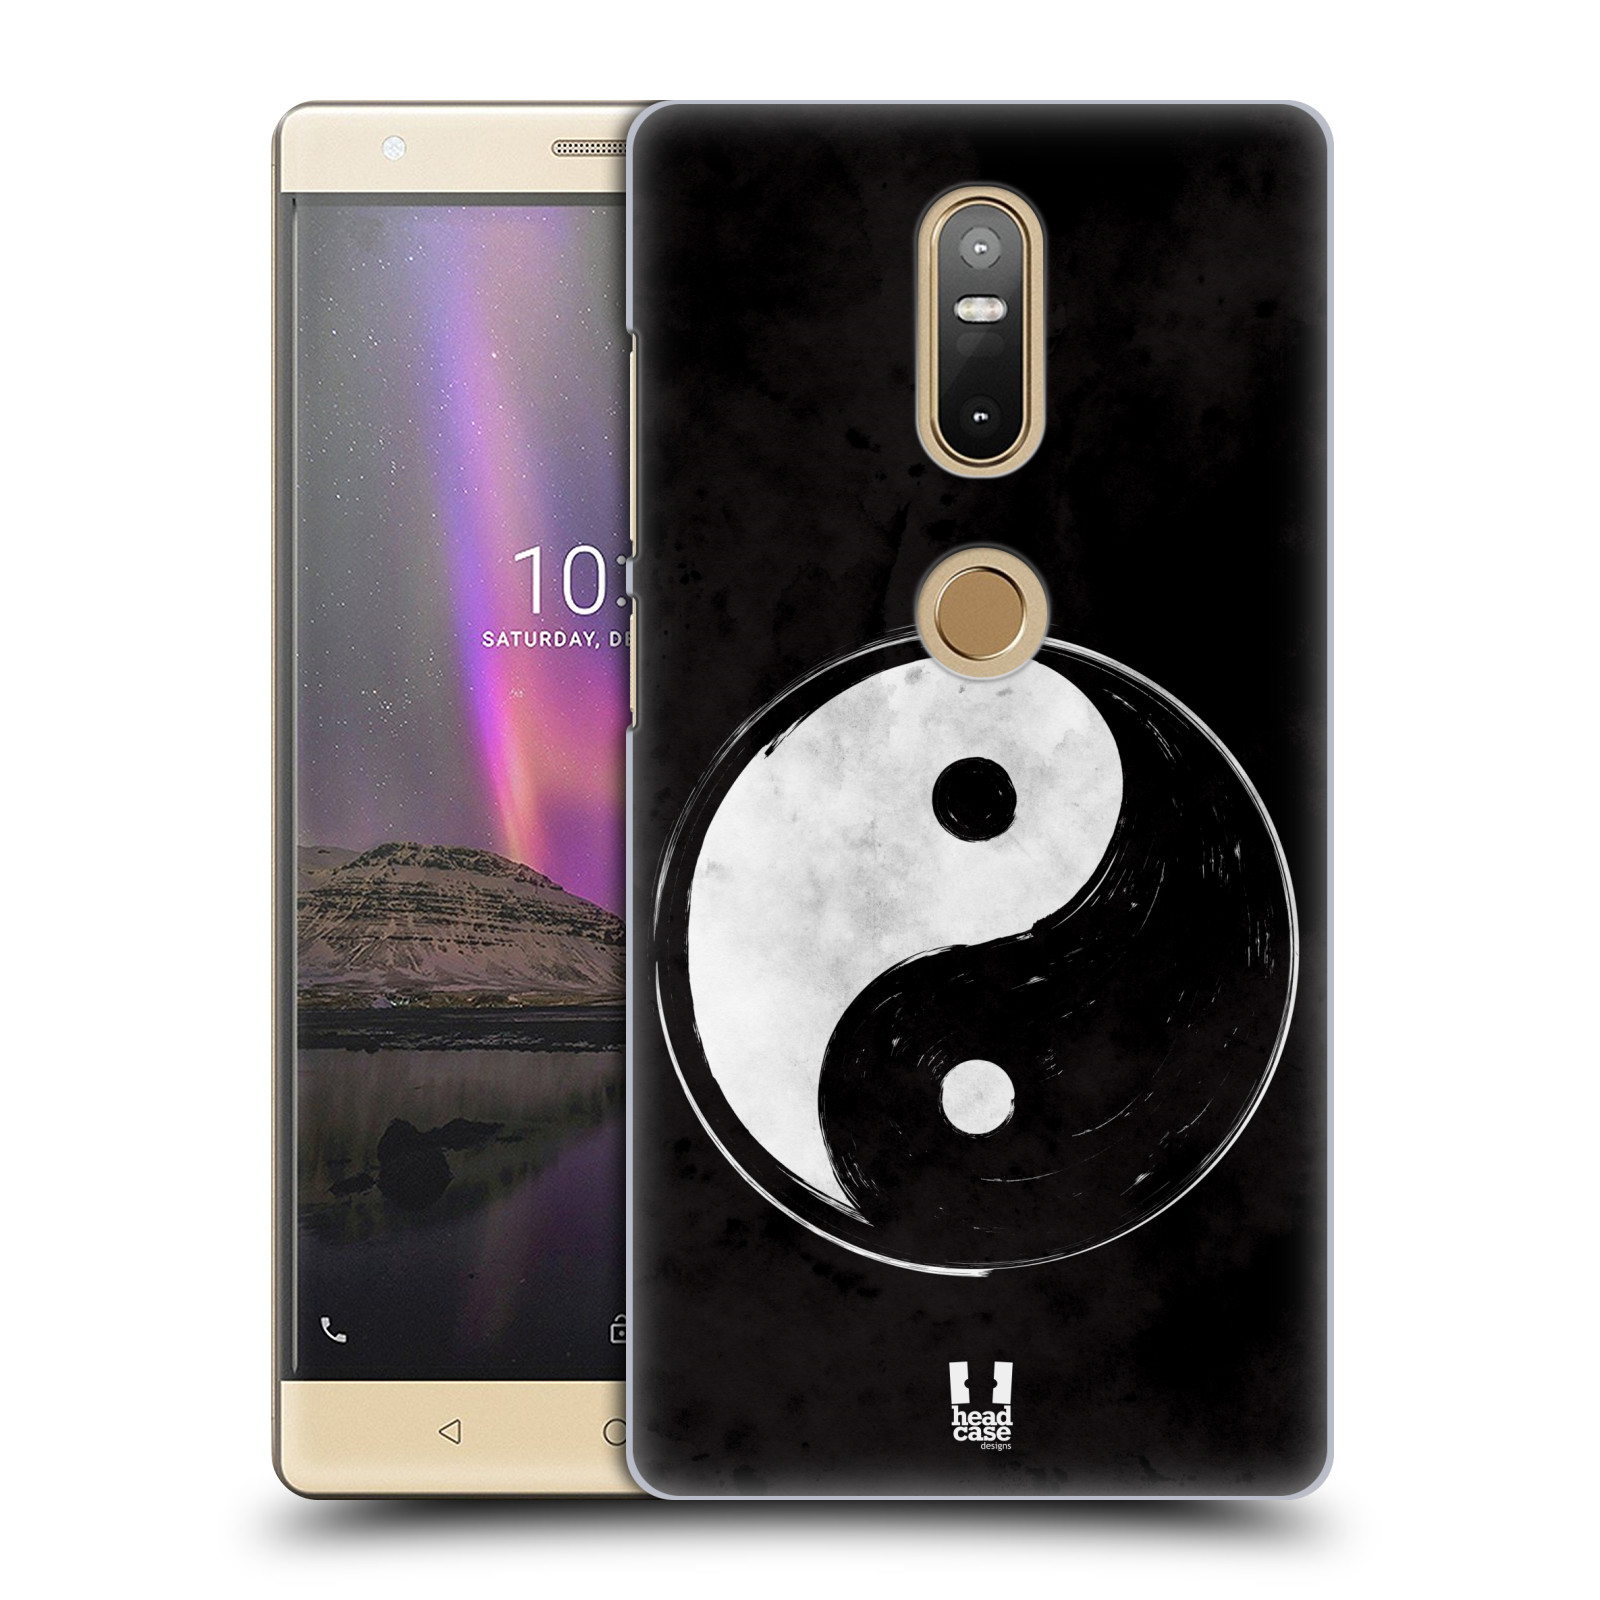 Plastové pouzdro na mobil Lenovo Phab 2 Plus - Head Case - Yin a Yang BW (Plastový kryt či obal na mobilní telefon Lenovo Phab 2 Plus Dual SIM s motivem Yin a Yang BW)